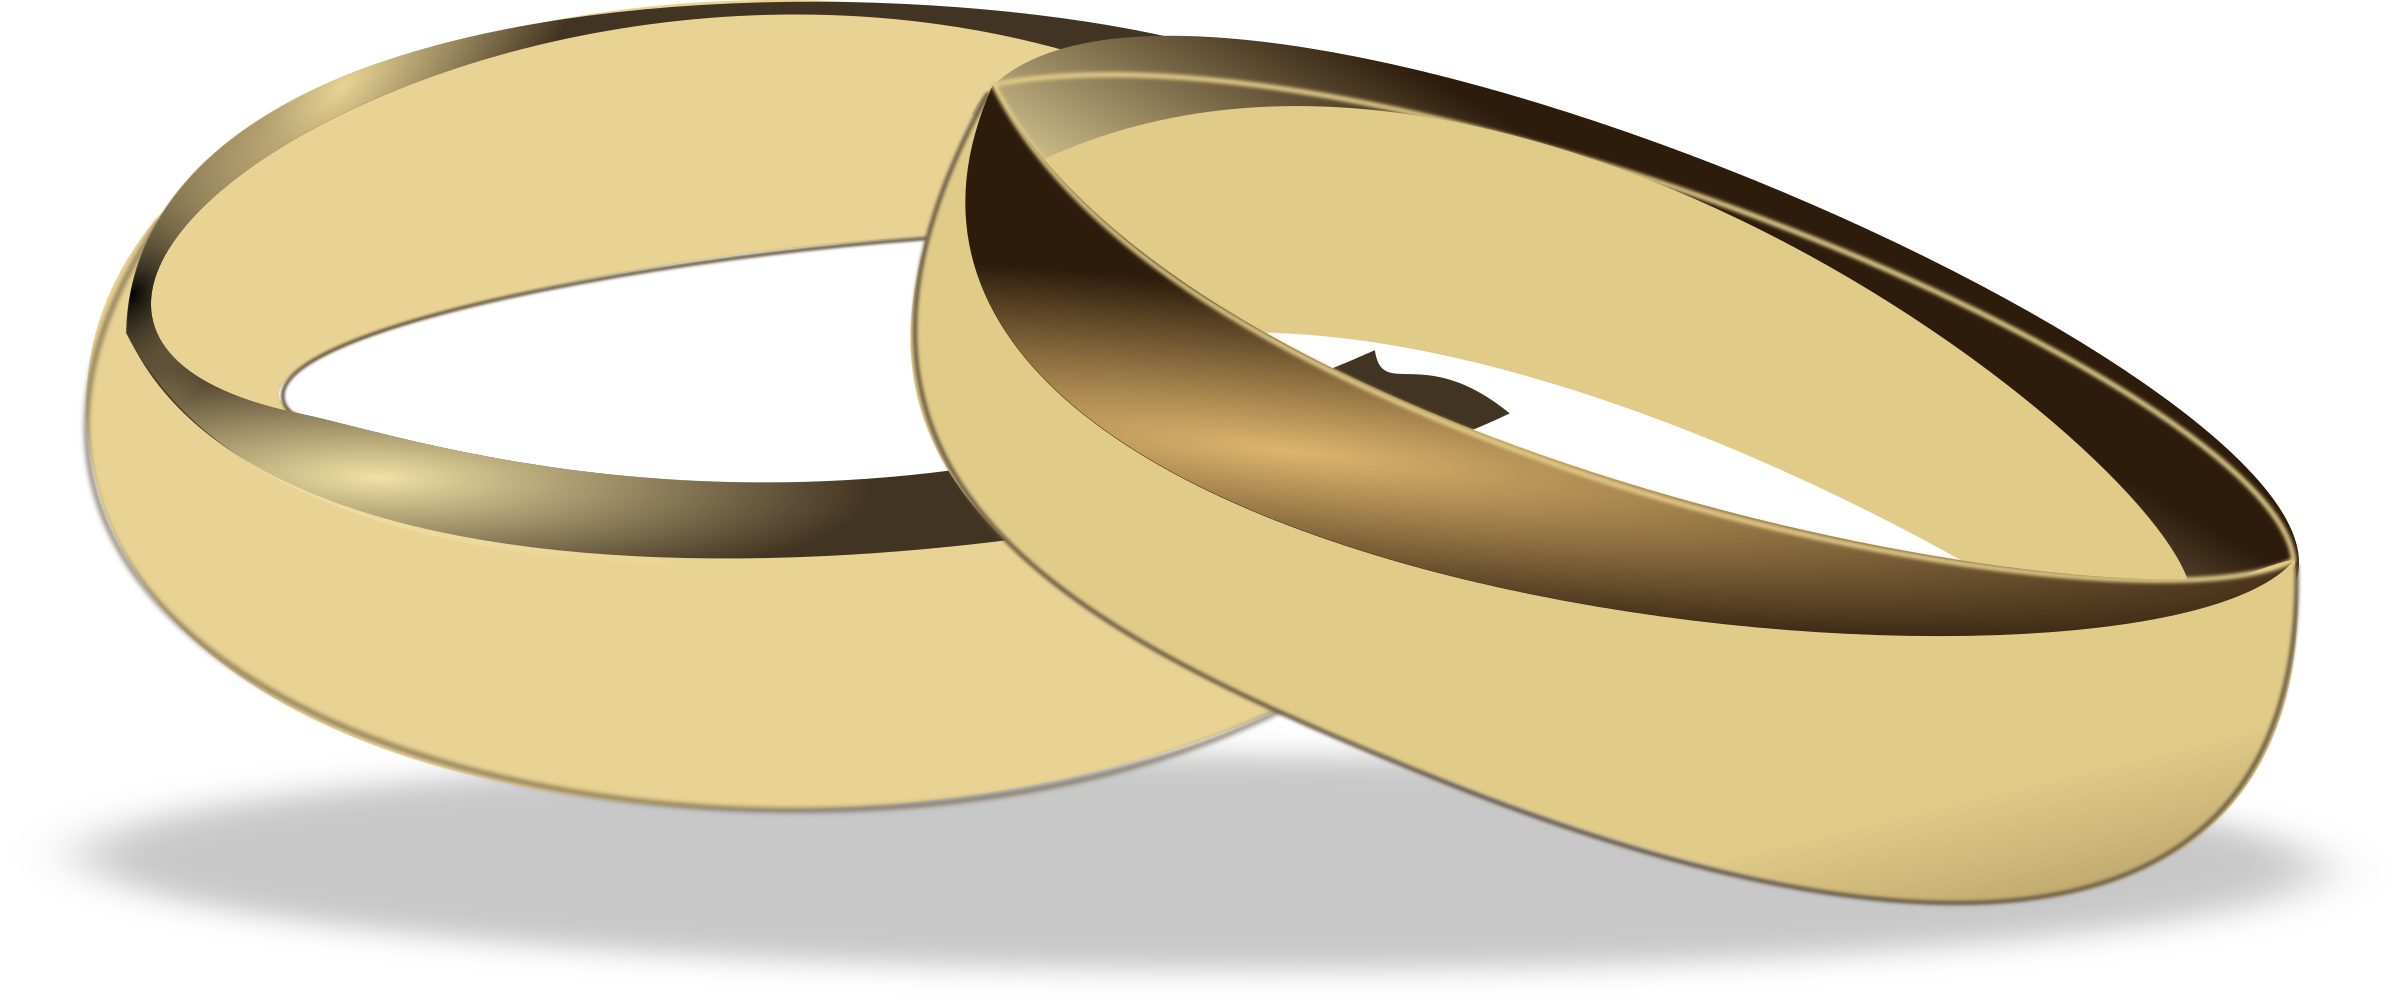 Ocean clipart wedding. Rings big image png